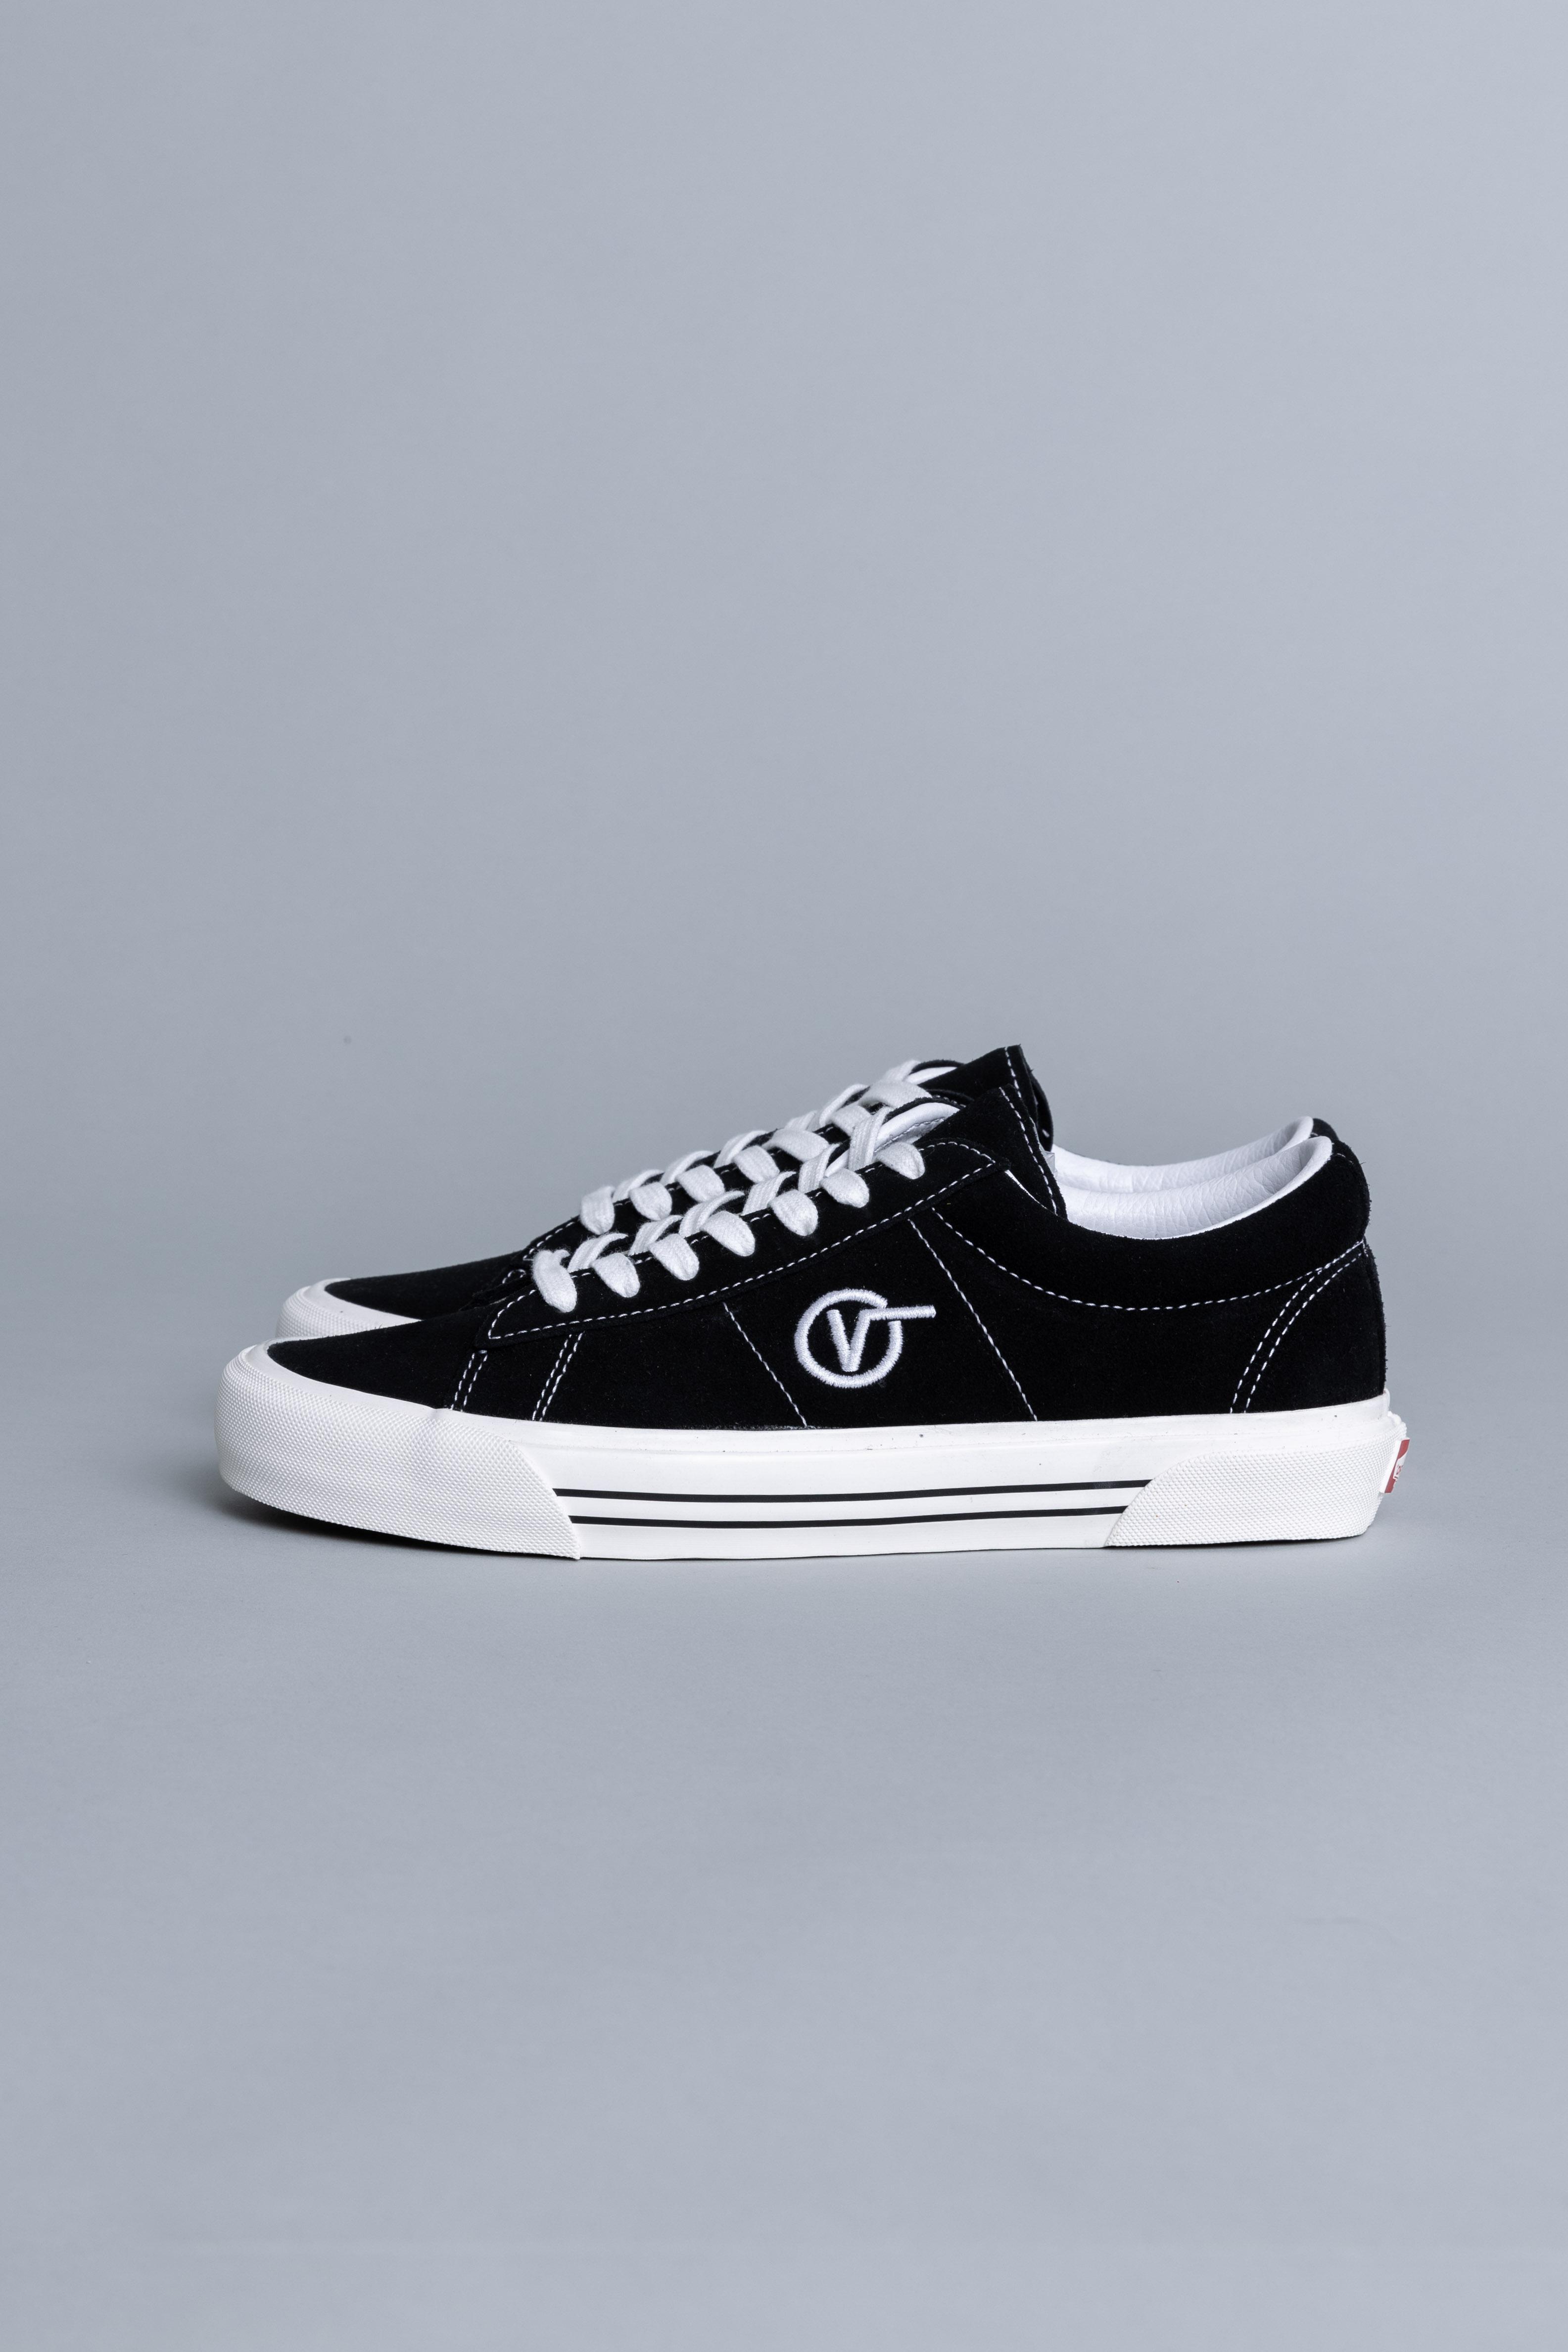 Vans Sid DX OG Black (Anaheim Factory